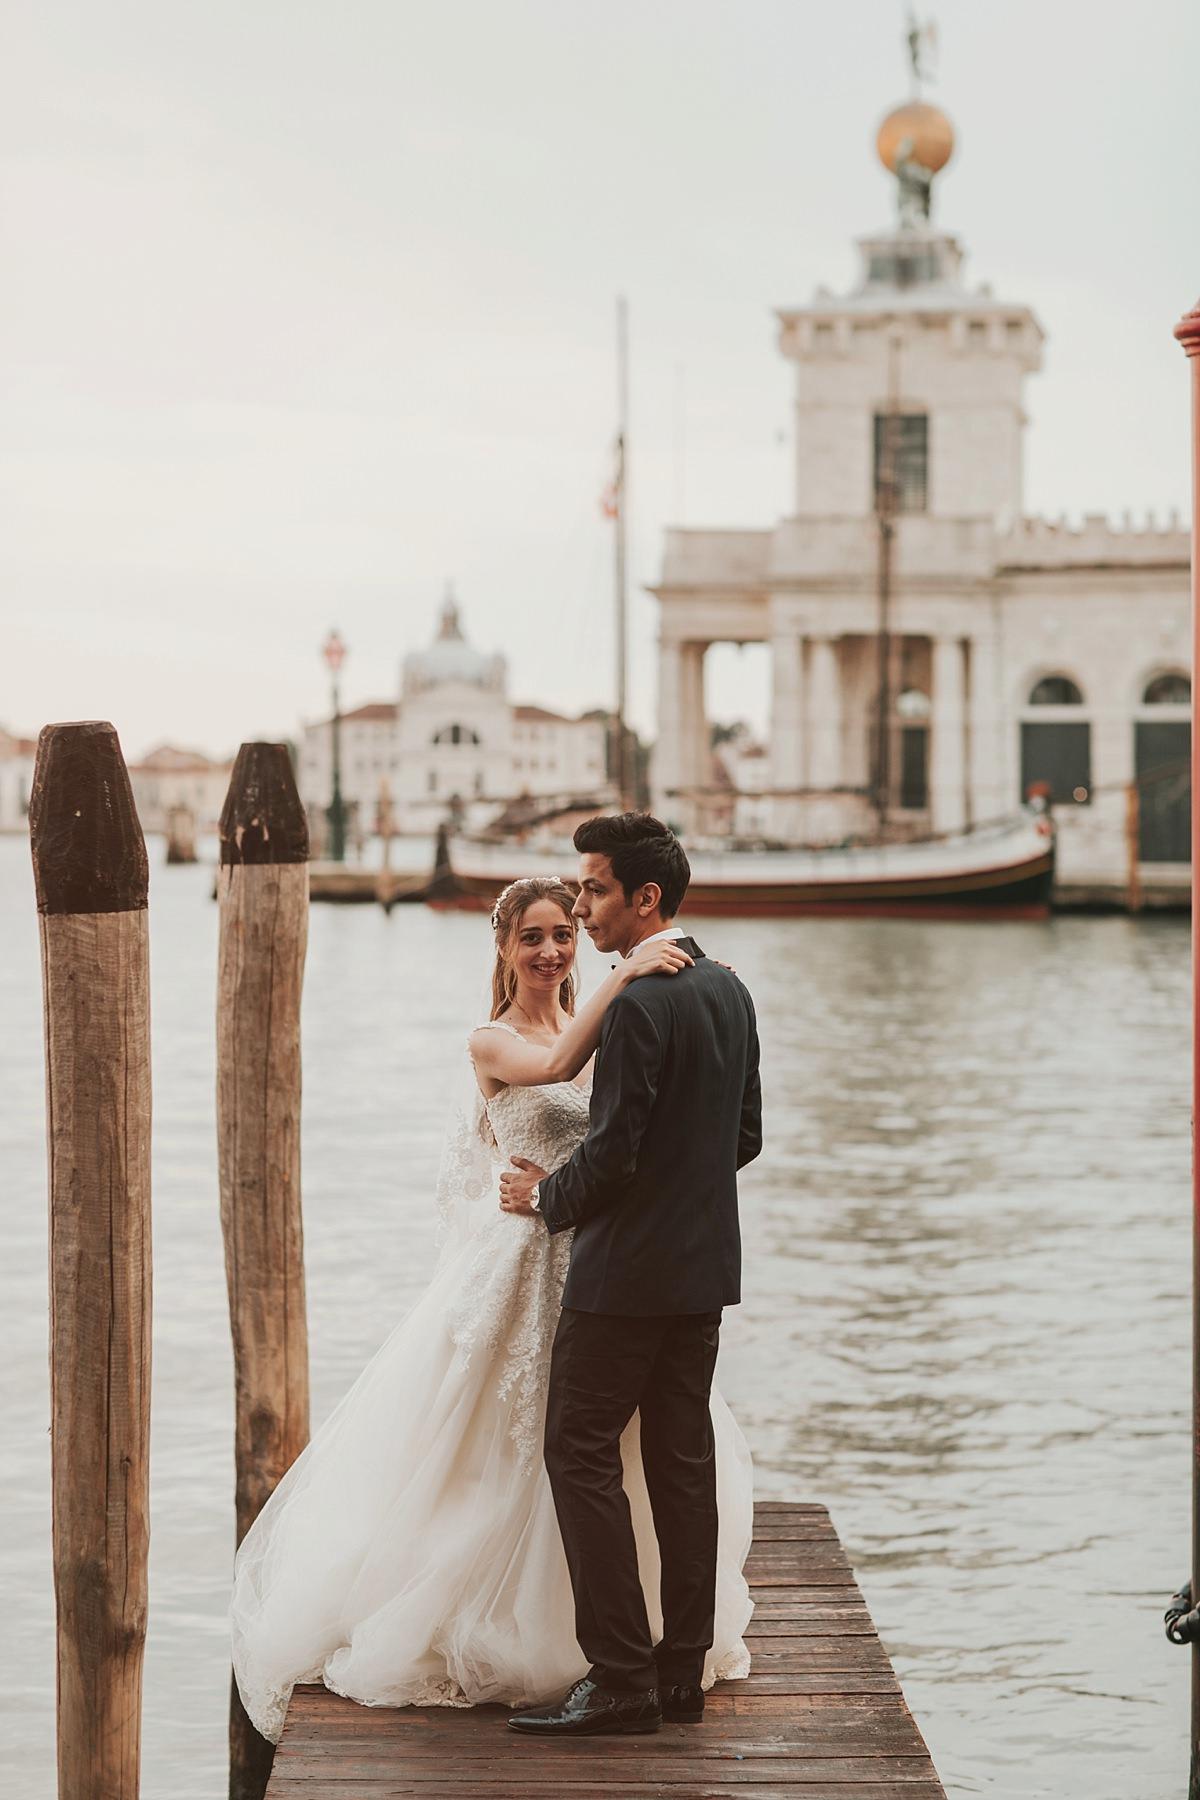 romantica-luna-di-miele-a-venezia_0004